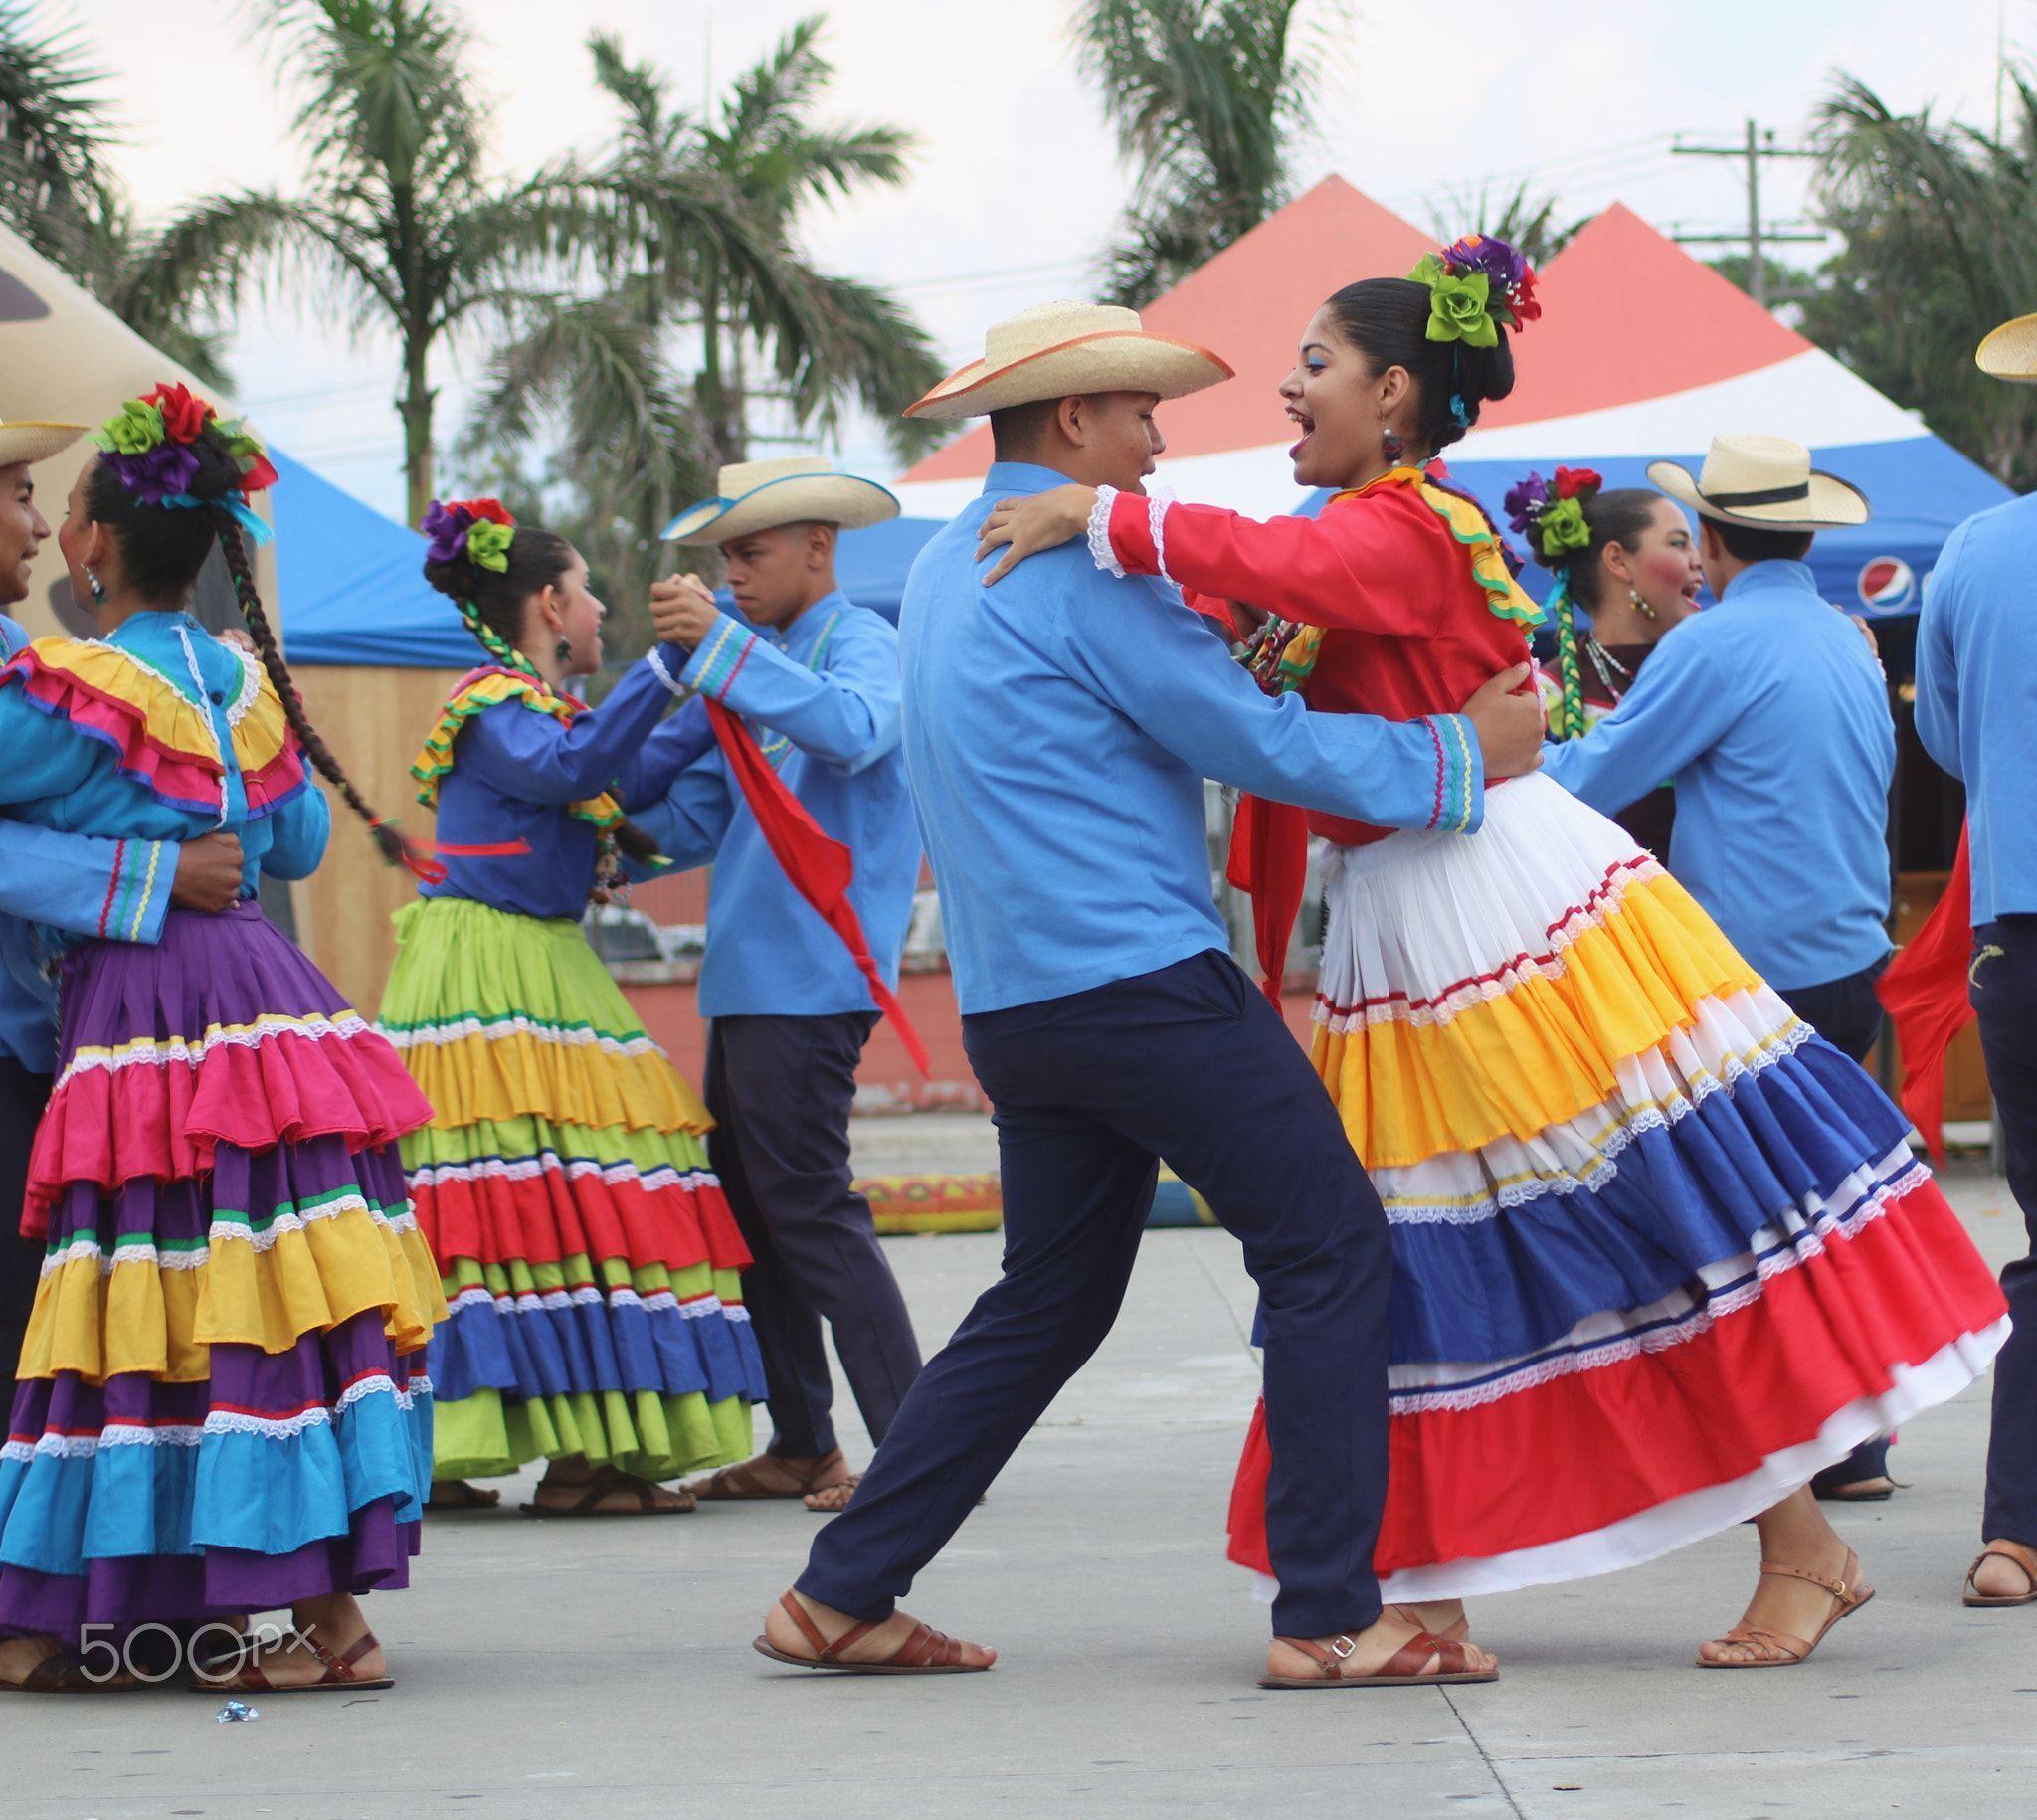 Folklore dance ||| San Pedro Sula, #Honduras #sanpedrosula Folklore dance ||| San Pedro Sula, #Honduras #sanpedrosula Folklore dance ||| San Pedro Sula, #Honduras #sanpedrosula Folklore dance ||| San Pedro Sula, #Honduras #sanpedrosula Folklore dance ||| San Pedro Sula, #Honduras #sanpedrosula Folklore dance ||| San Pedro Sula, #Honduras #sanpedrosula Folklore dance ||| San Pedro Sula, #Honduras #sanpedrosula Folklore dance ||| San Pedro Sula, #Honduras #sanpedrosula